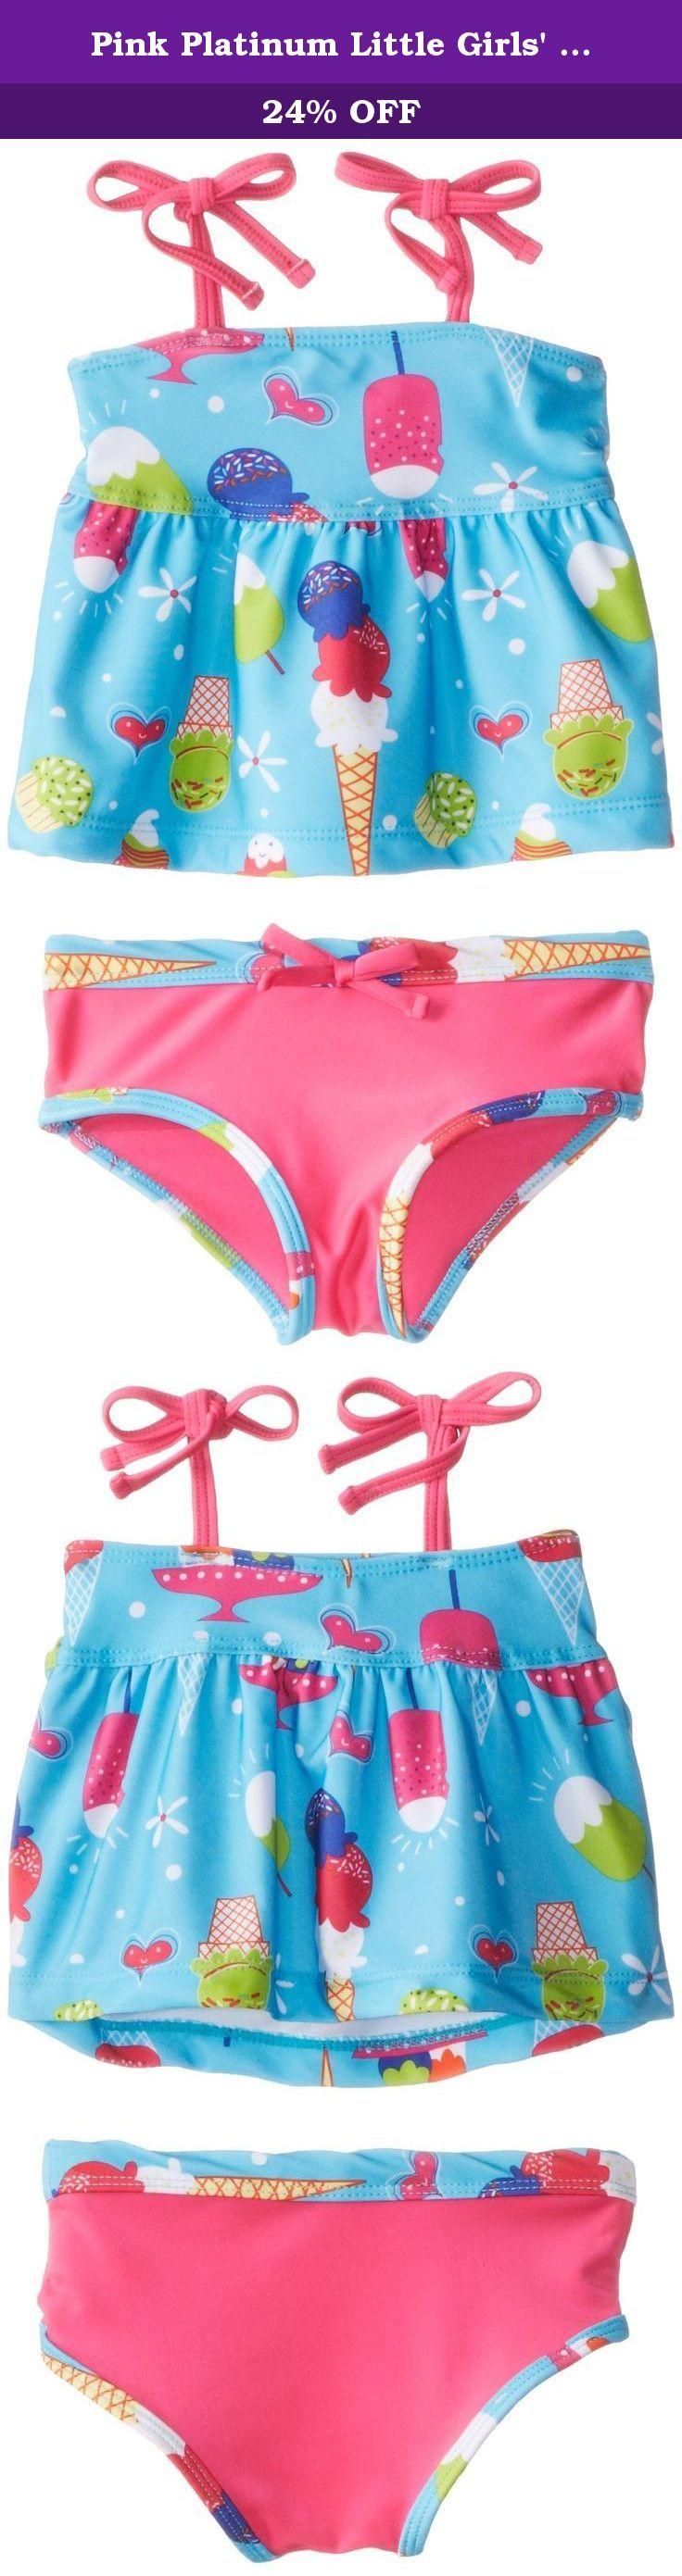 Pink Platinum Little Girls' Ice Cream Tankini, Turquoise, 2T. All over ice cream printed tankini.